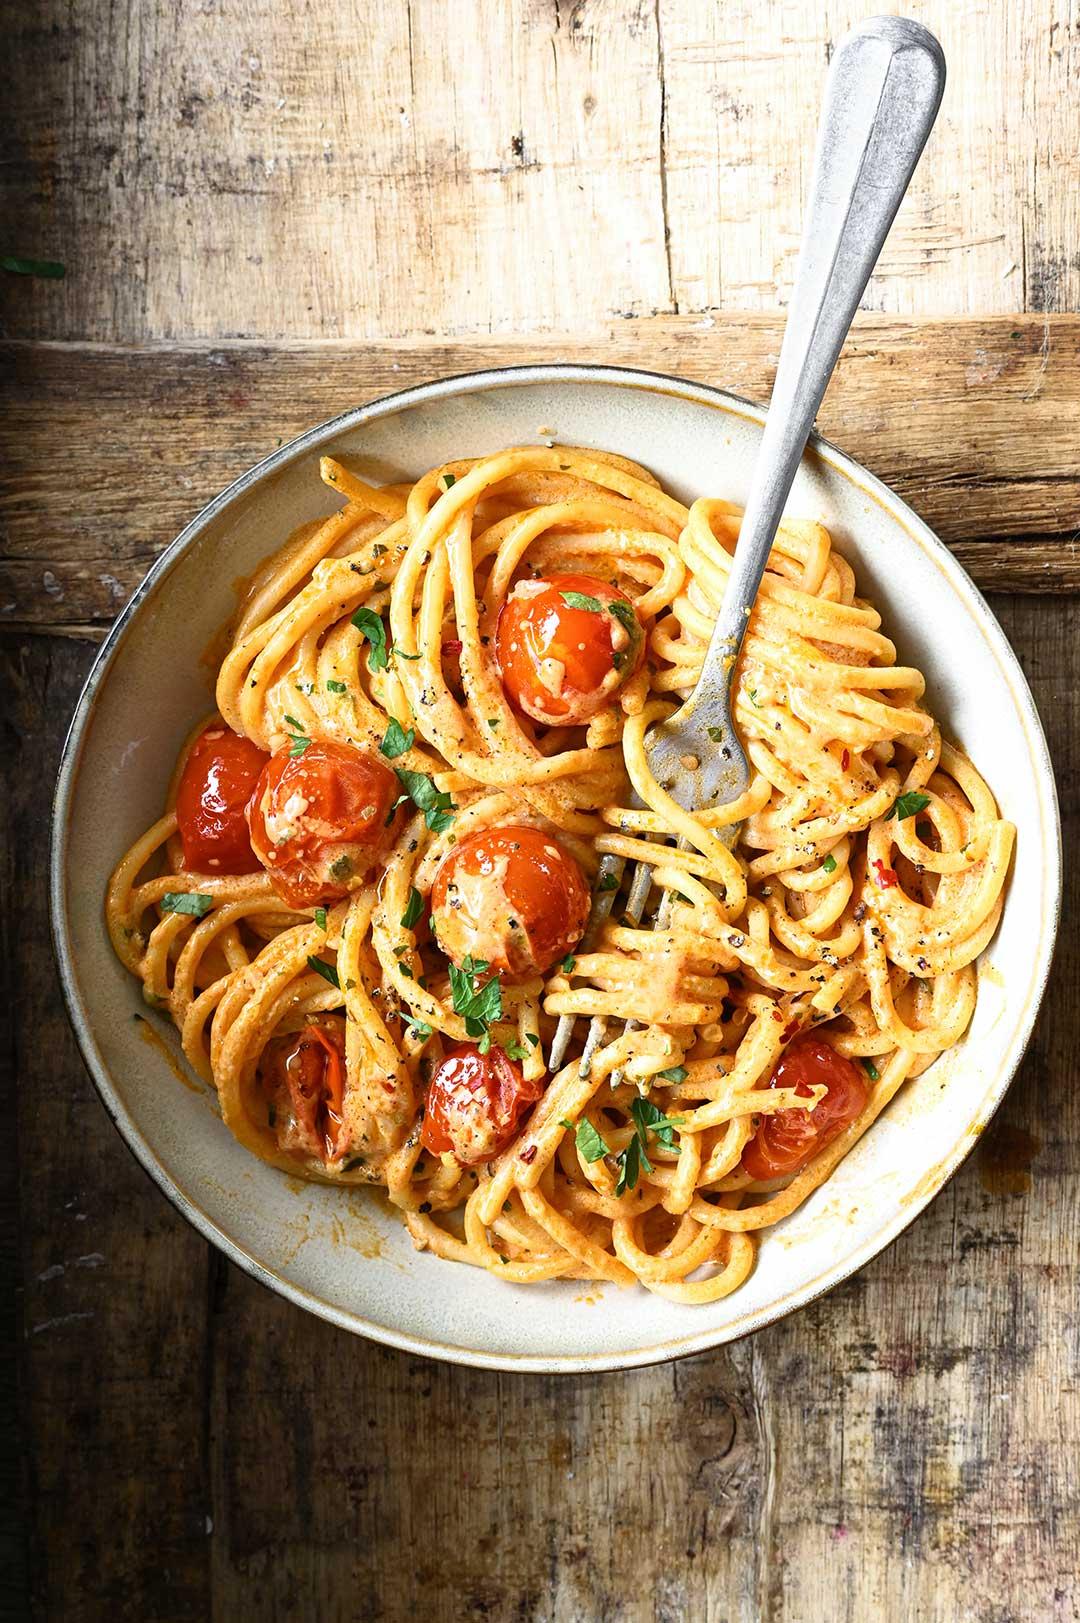 serving dumplings | Spicy Tomato and Cream Cheese Spaghetti